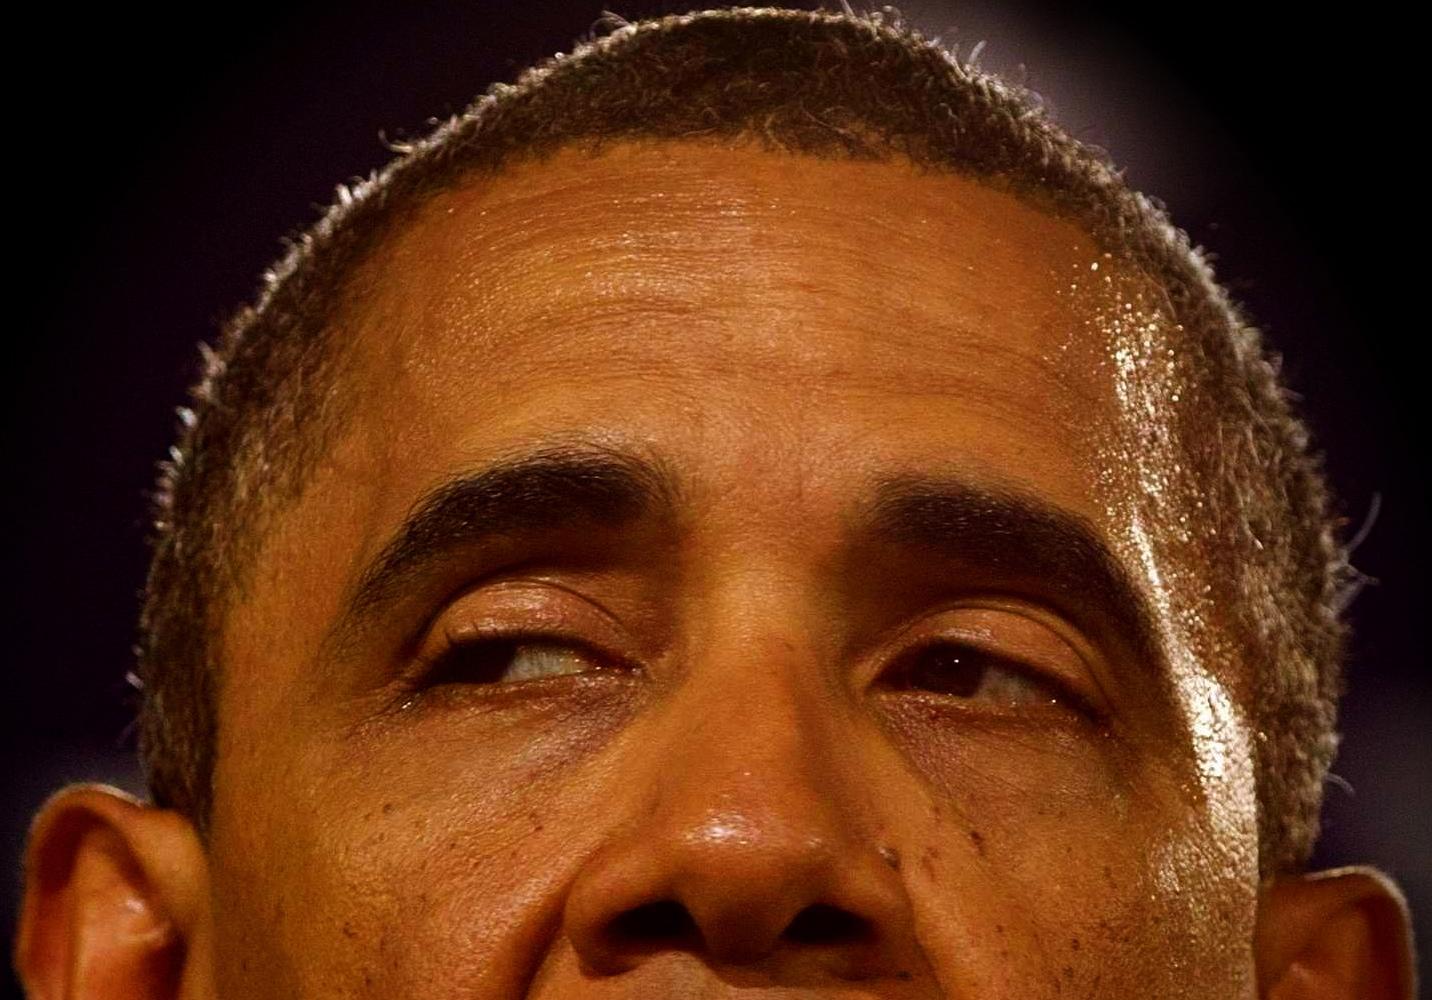 obama u2019s liberal lapdogs attack matt drudge for daring to speak the truth